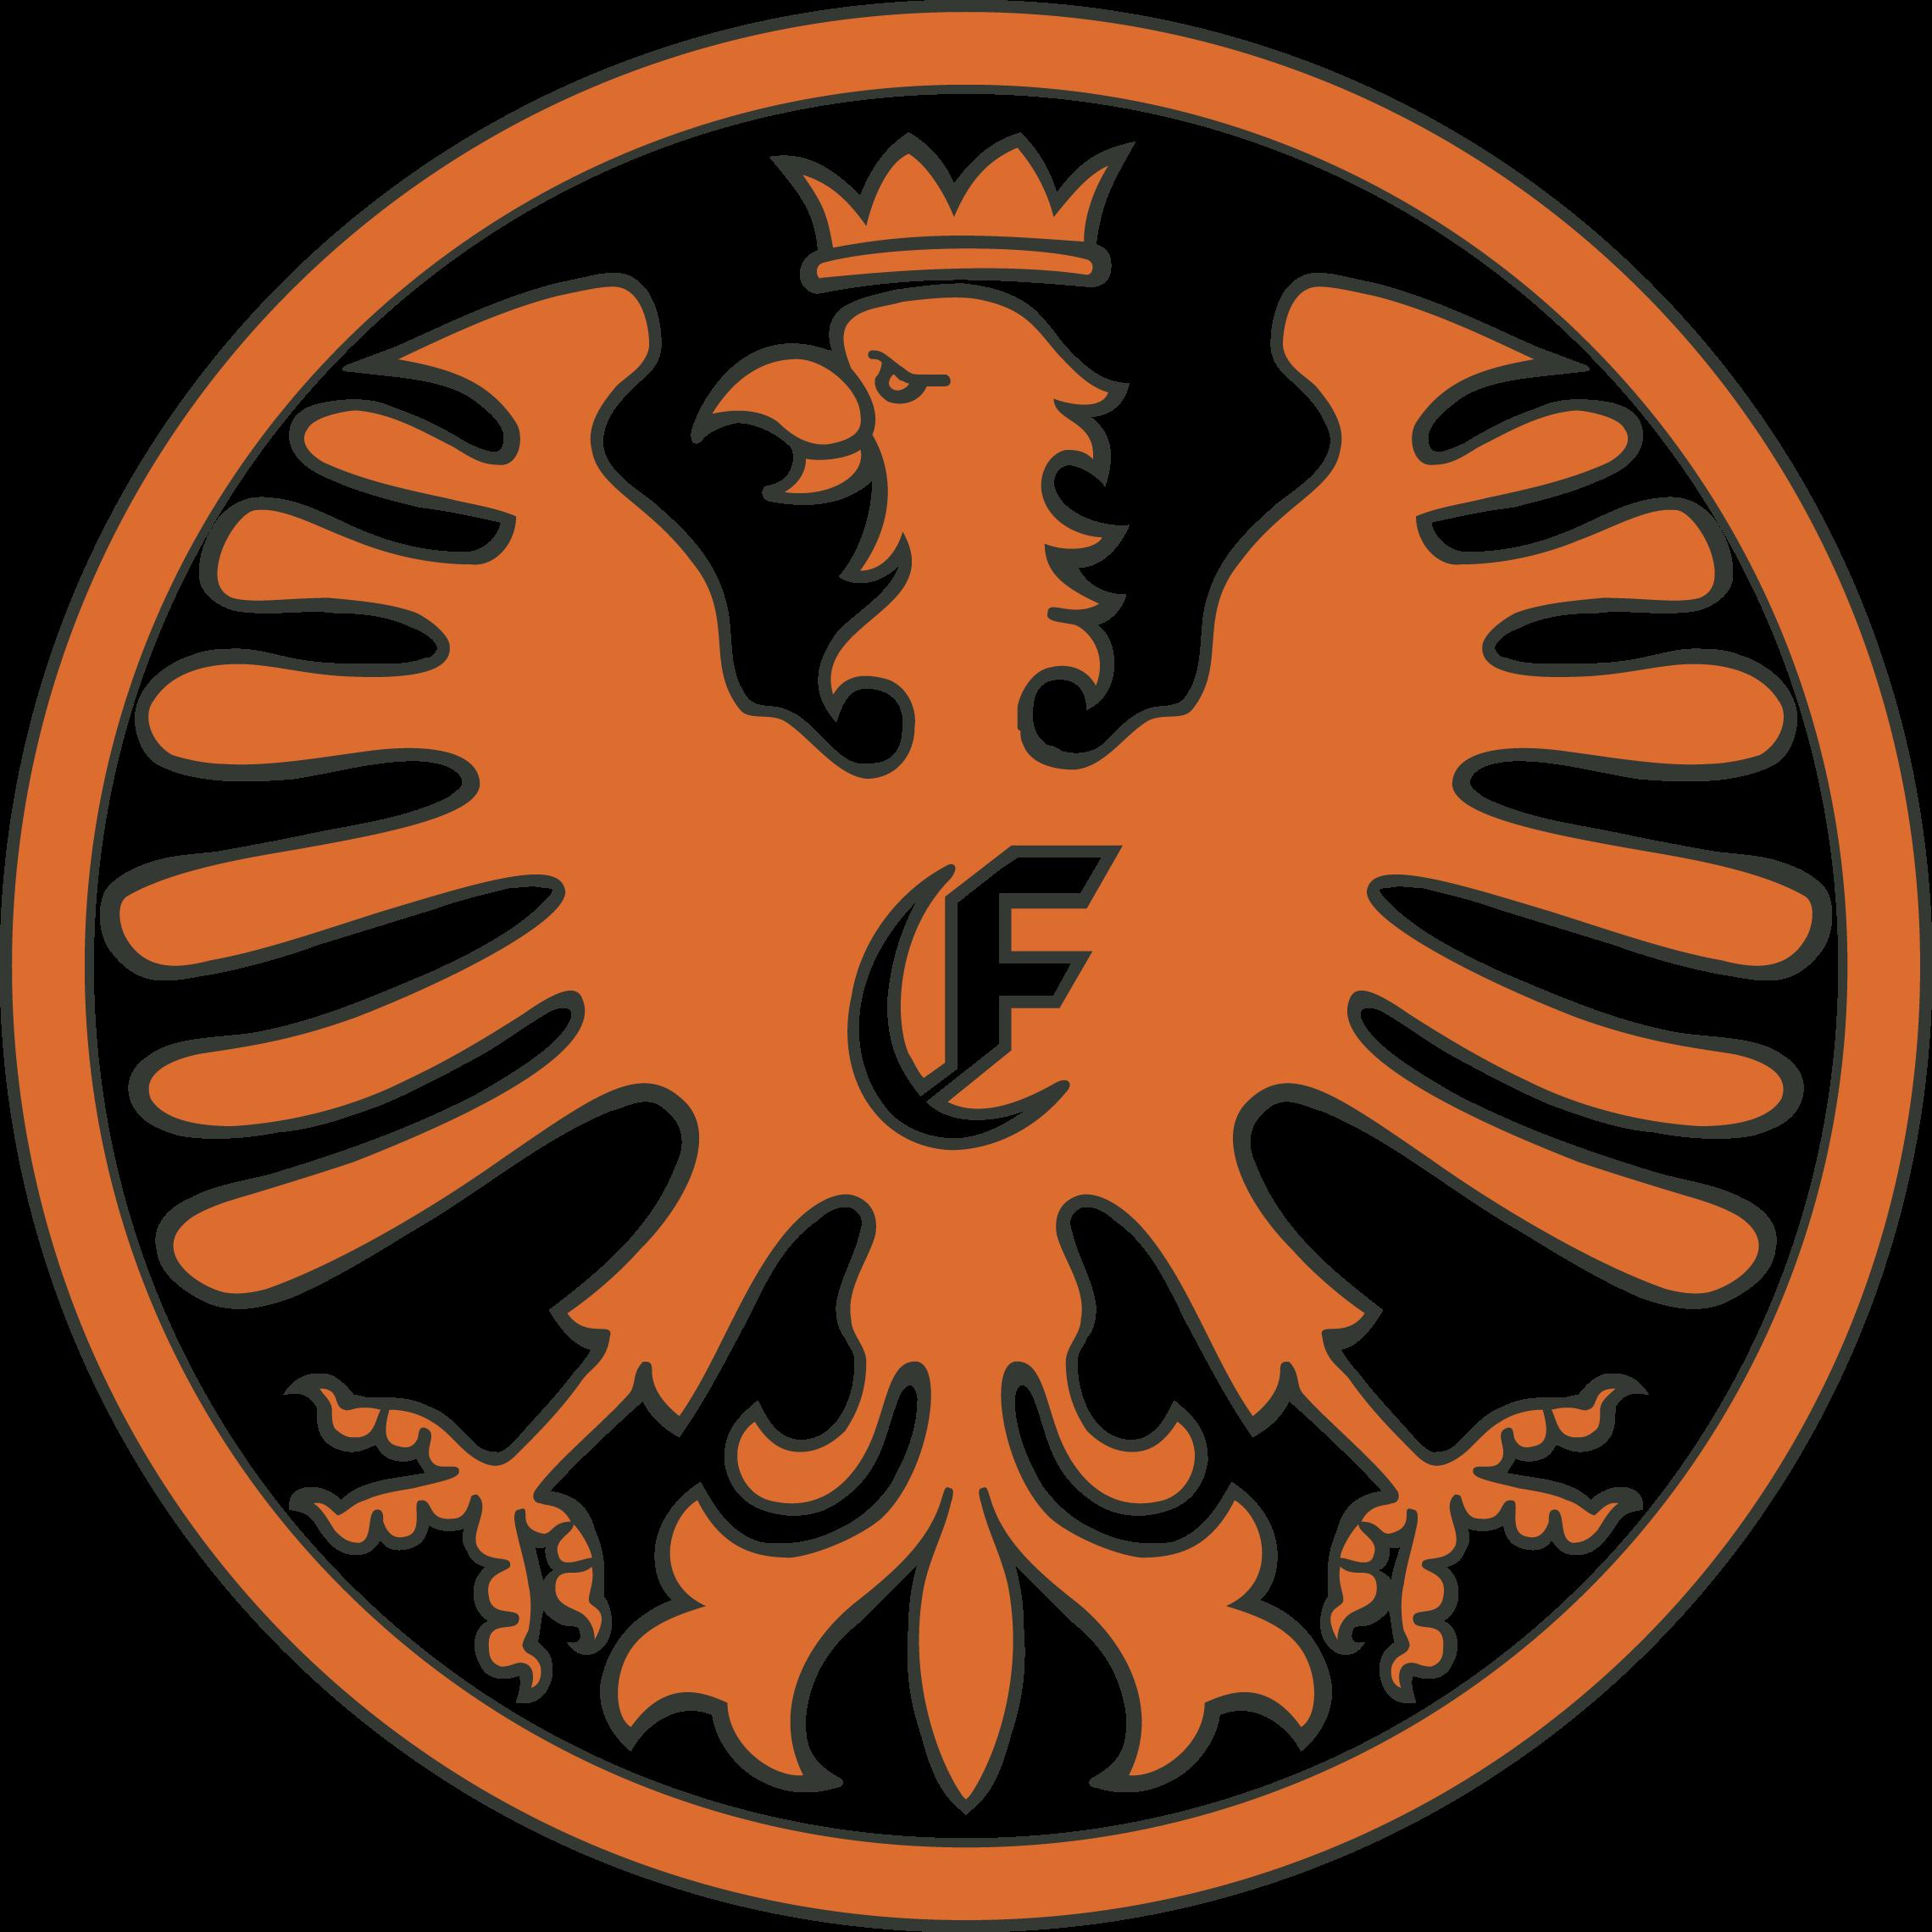 Sportvereine Frankfurt